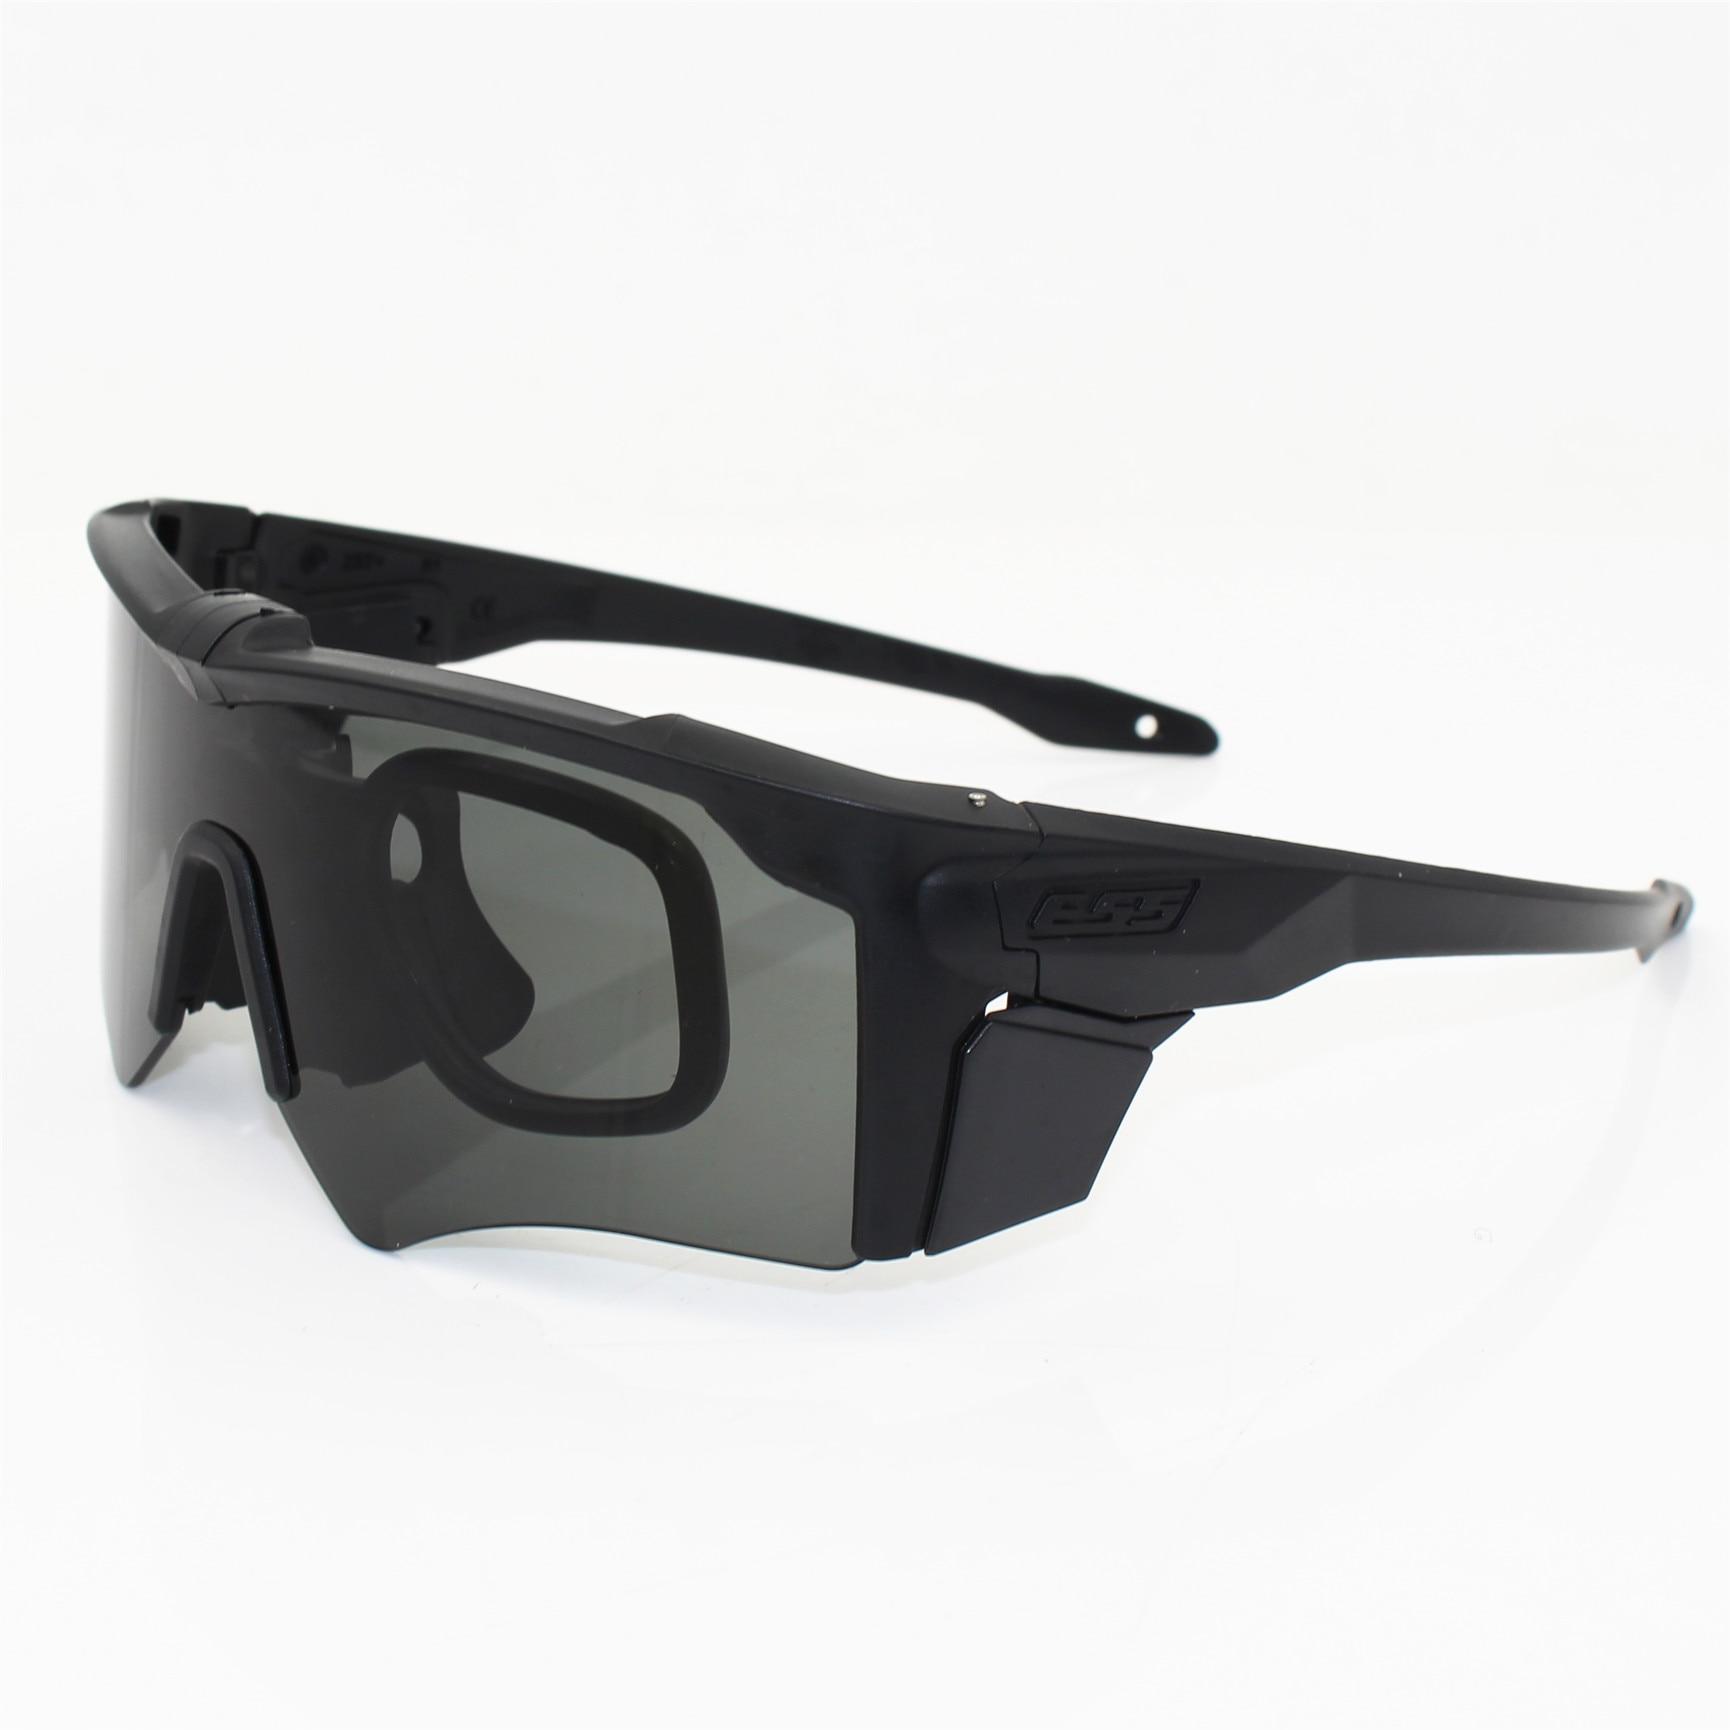 AF military goggles 3 Lens Ballistic Military Sport MenPolarized Sunglasses Army Bullet-proof Eyewear shooting